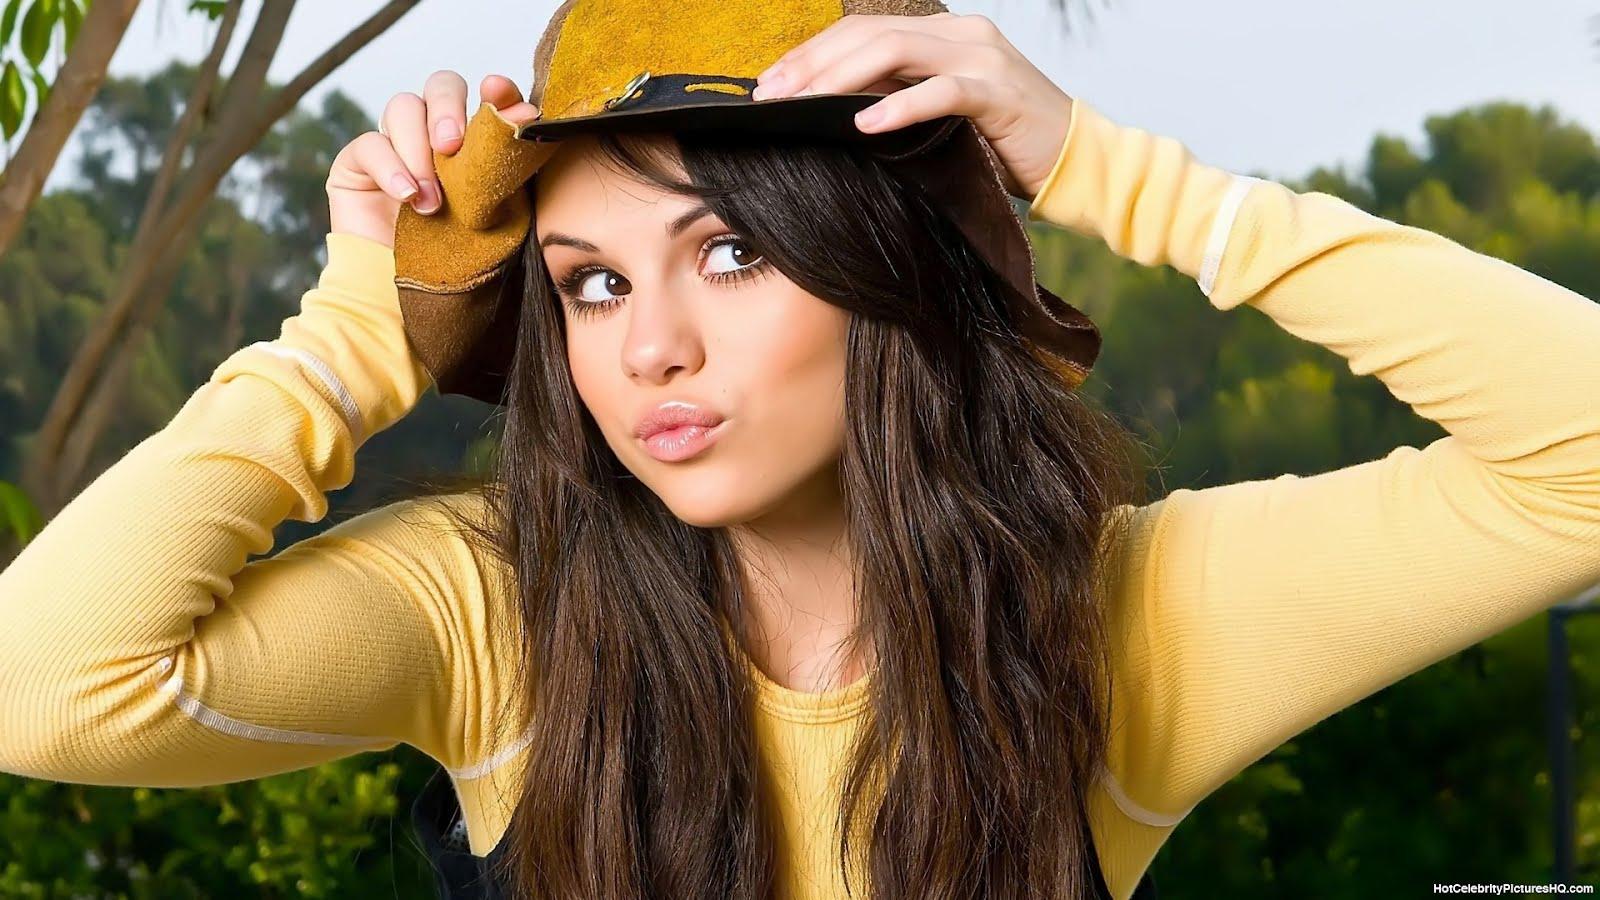 Selena Gomez HD Wallpapers 1600x900